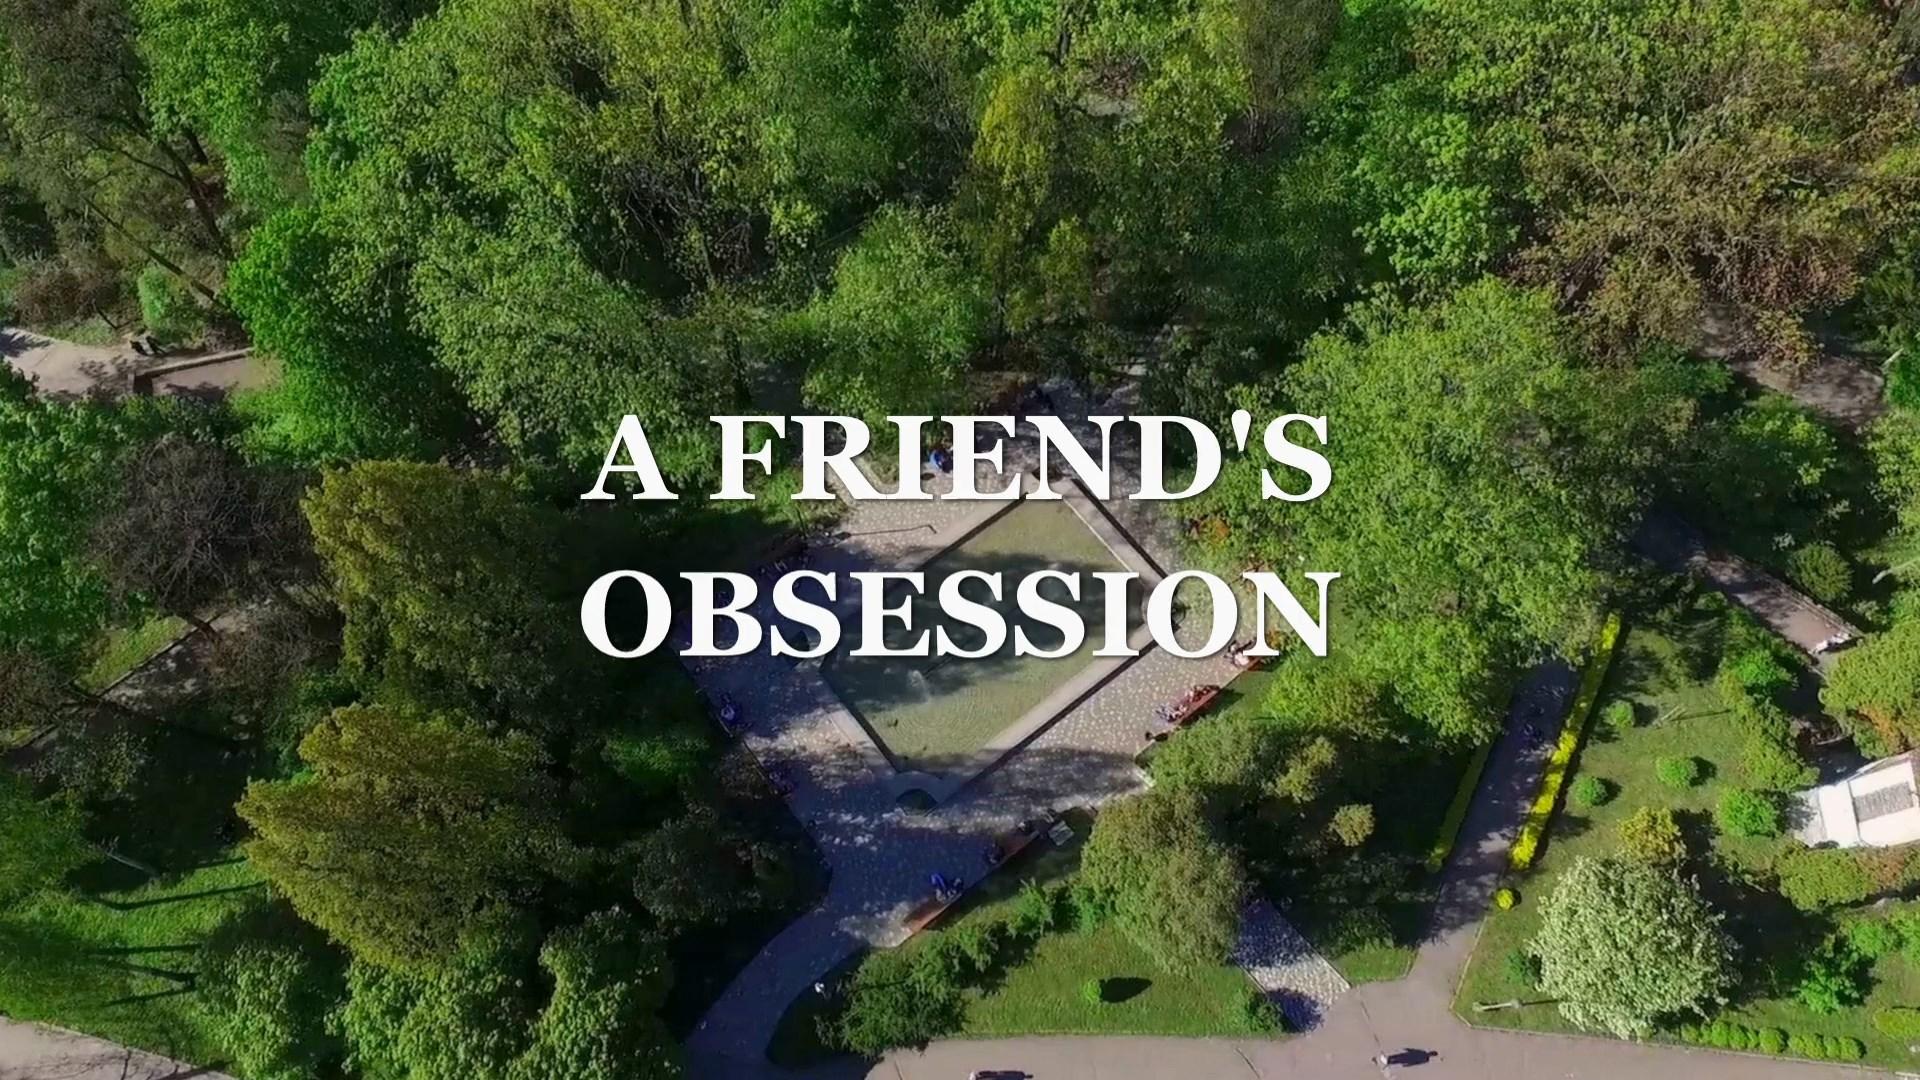 Una Amistad Obsesiva (2018) 1080p WEB-DL AMZN Latino